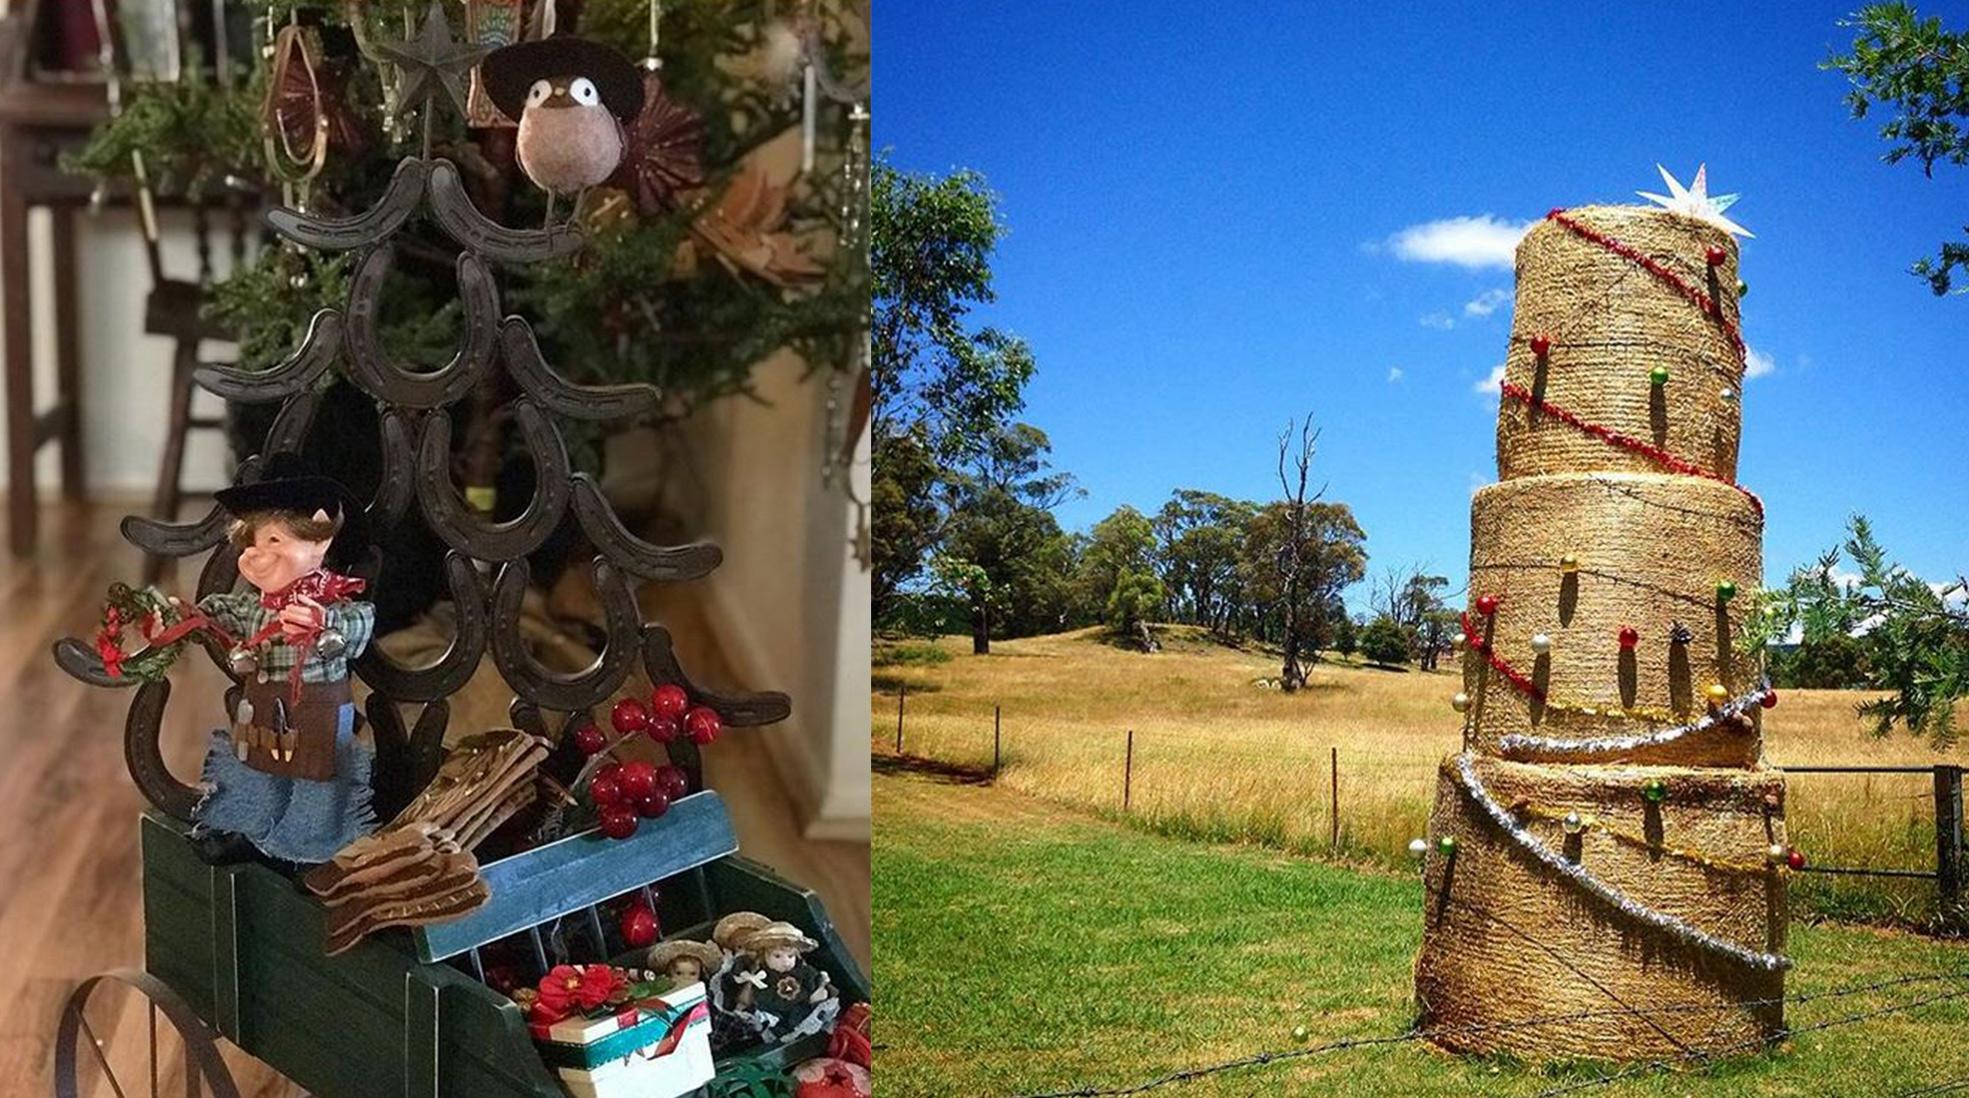 O' Christmas Tree: 15 Fun Farm-themed Trees